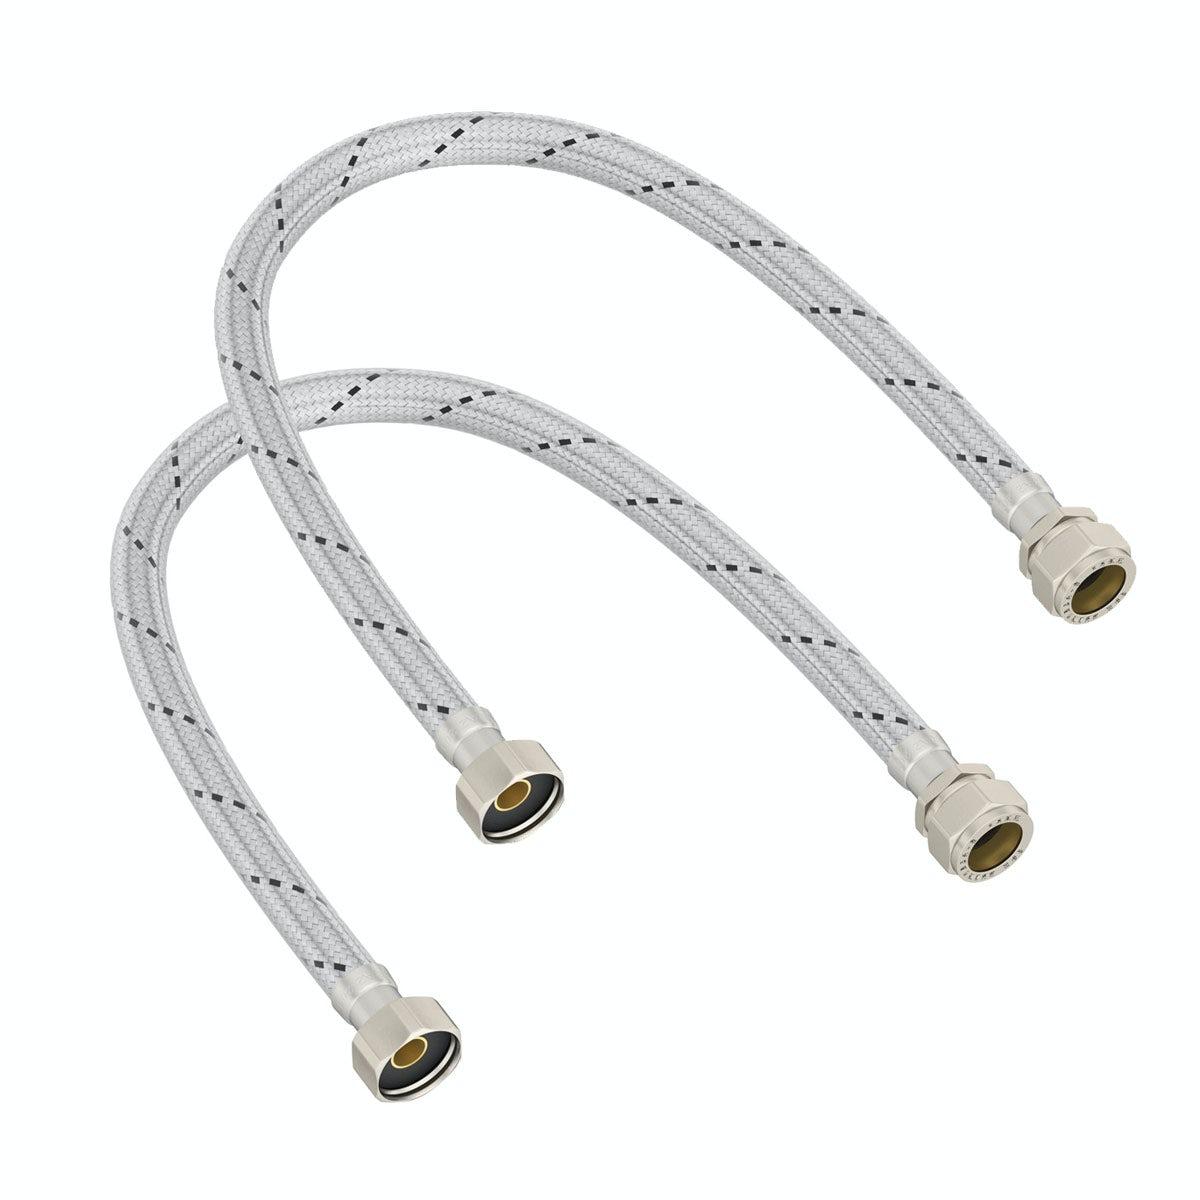 2 pack flexible tap connectors 12 x 15mm x 500mm. Black Bedroom Furniture Sets. Home Design Ideas